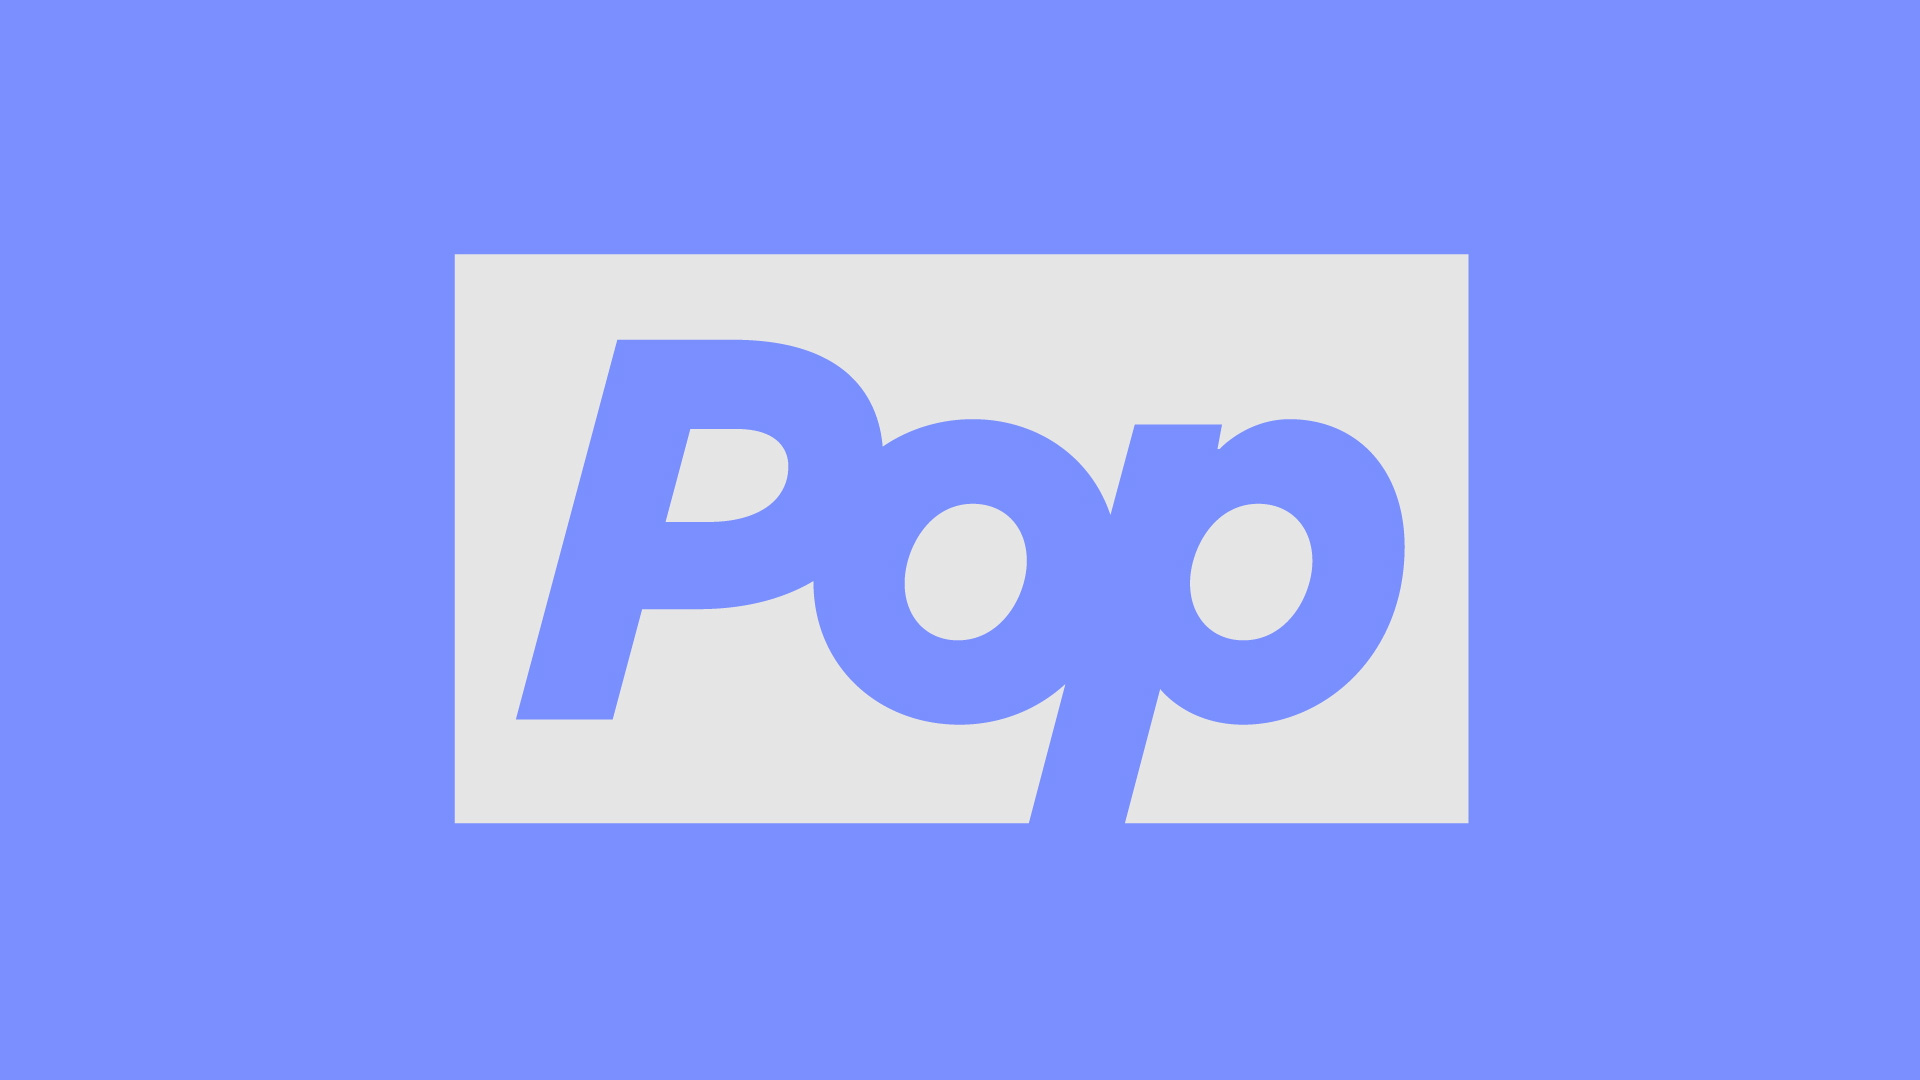 THEIMPOSSIBLE_Pop_01.jpg